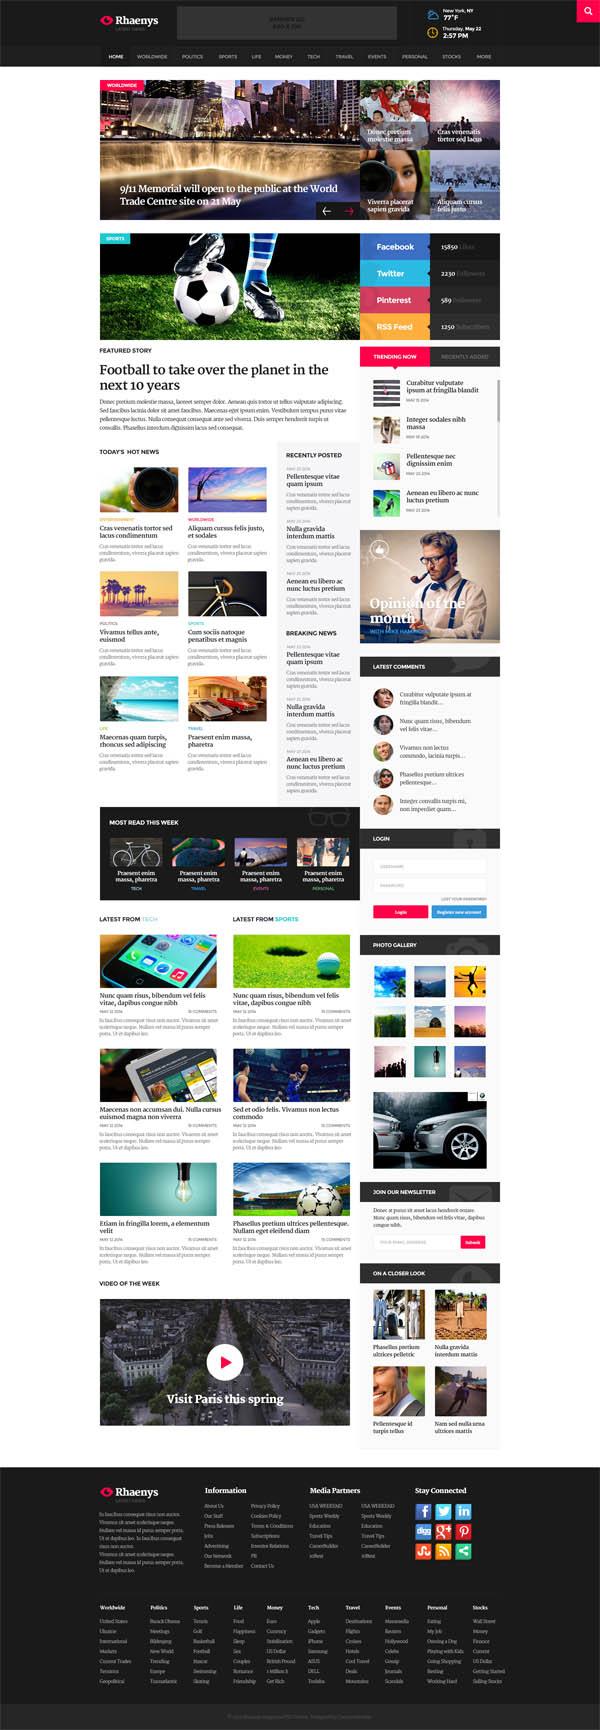 Rhaneys - PSD Magazine Theme